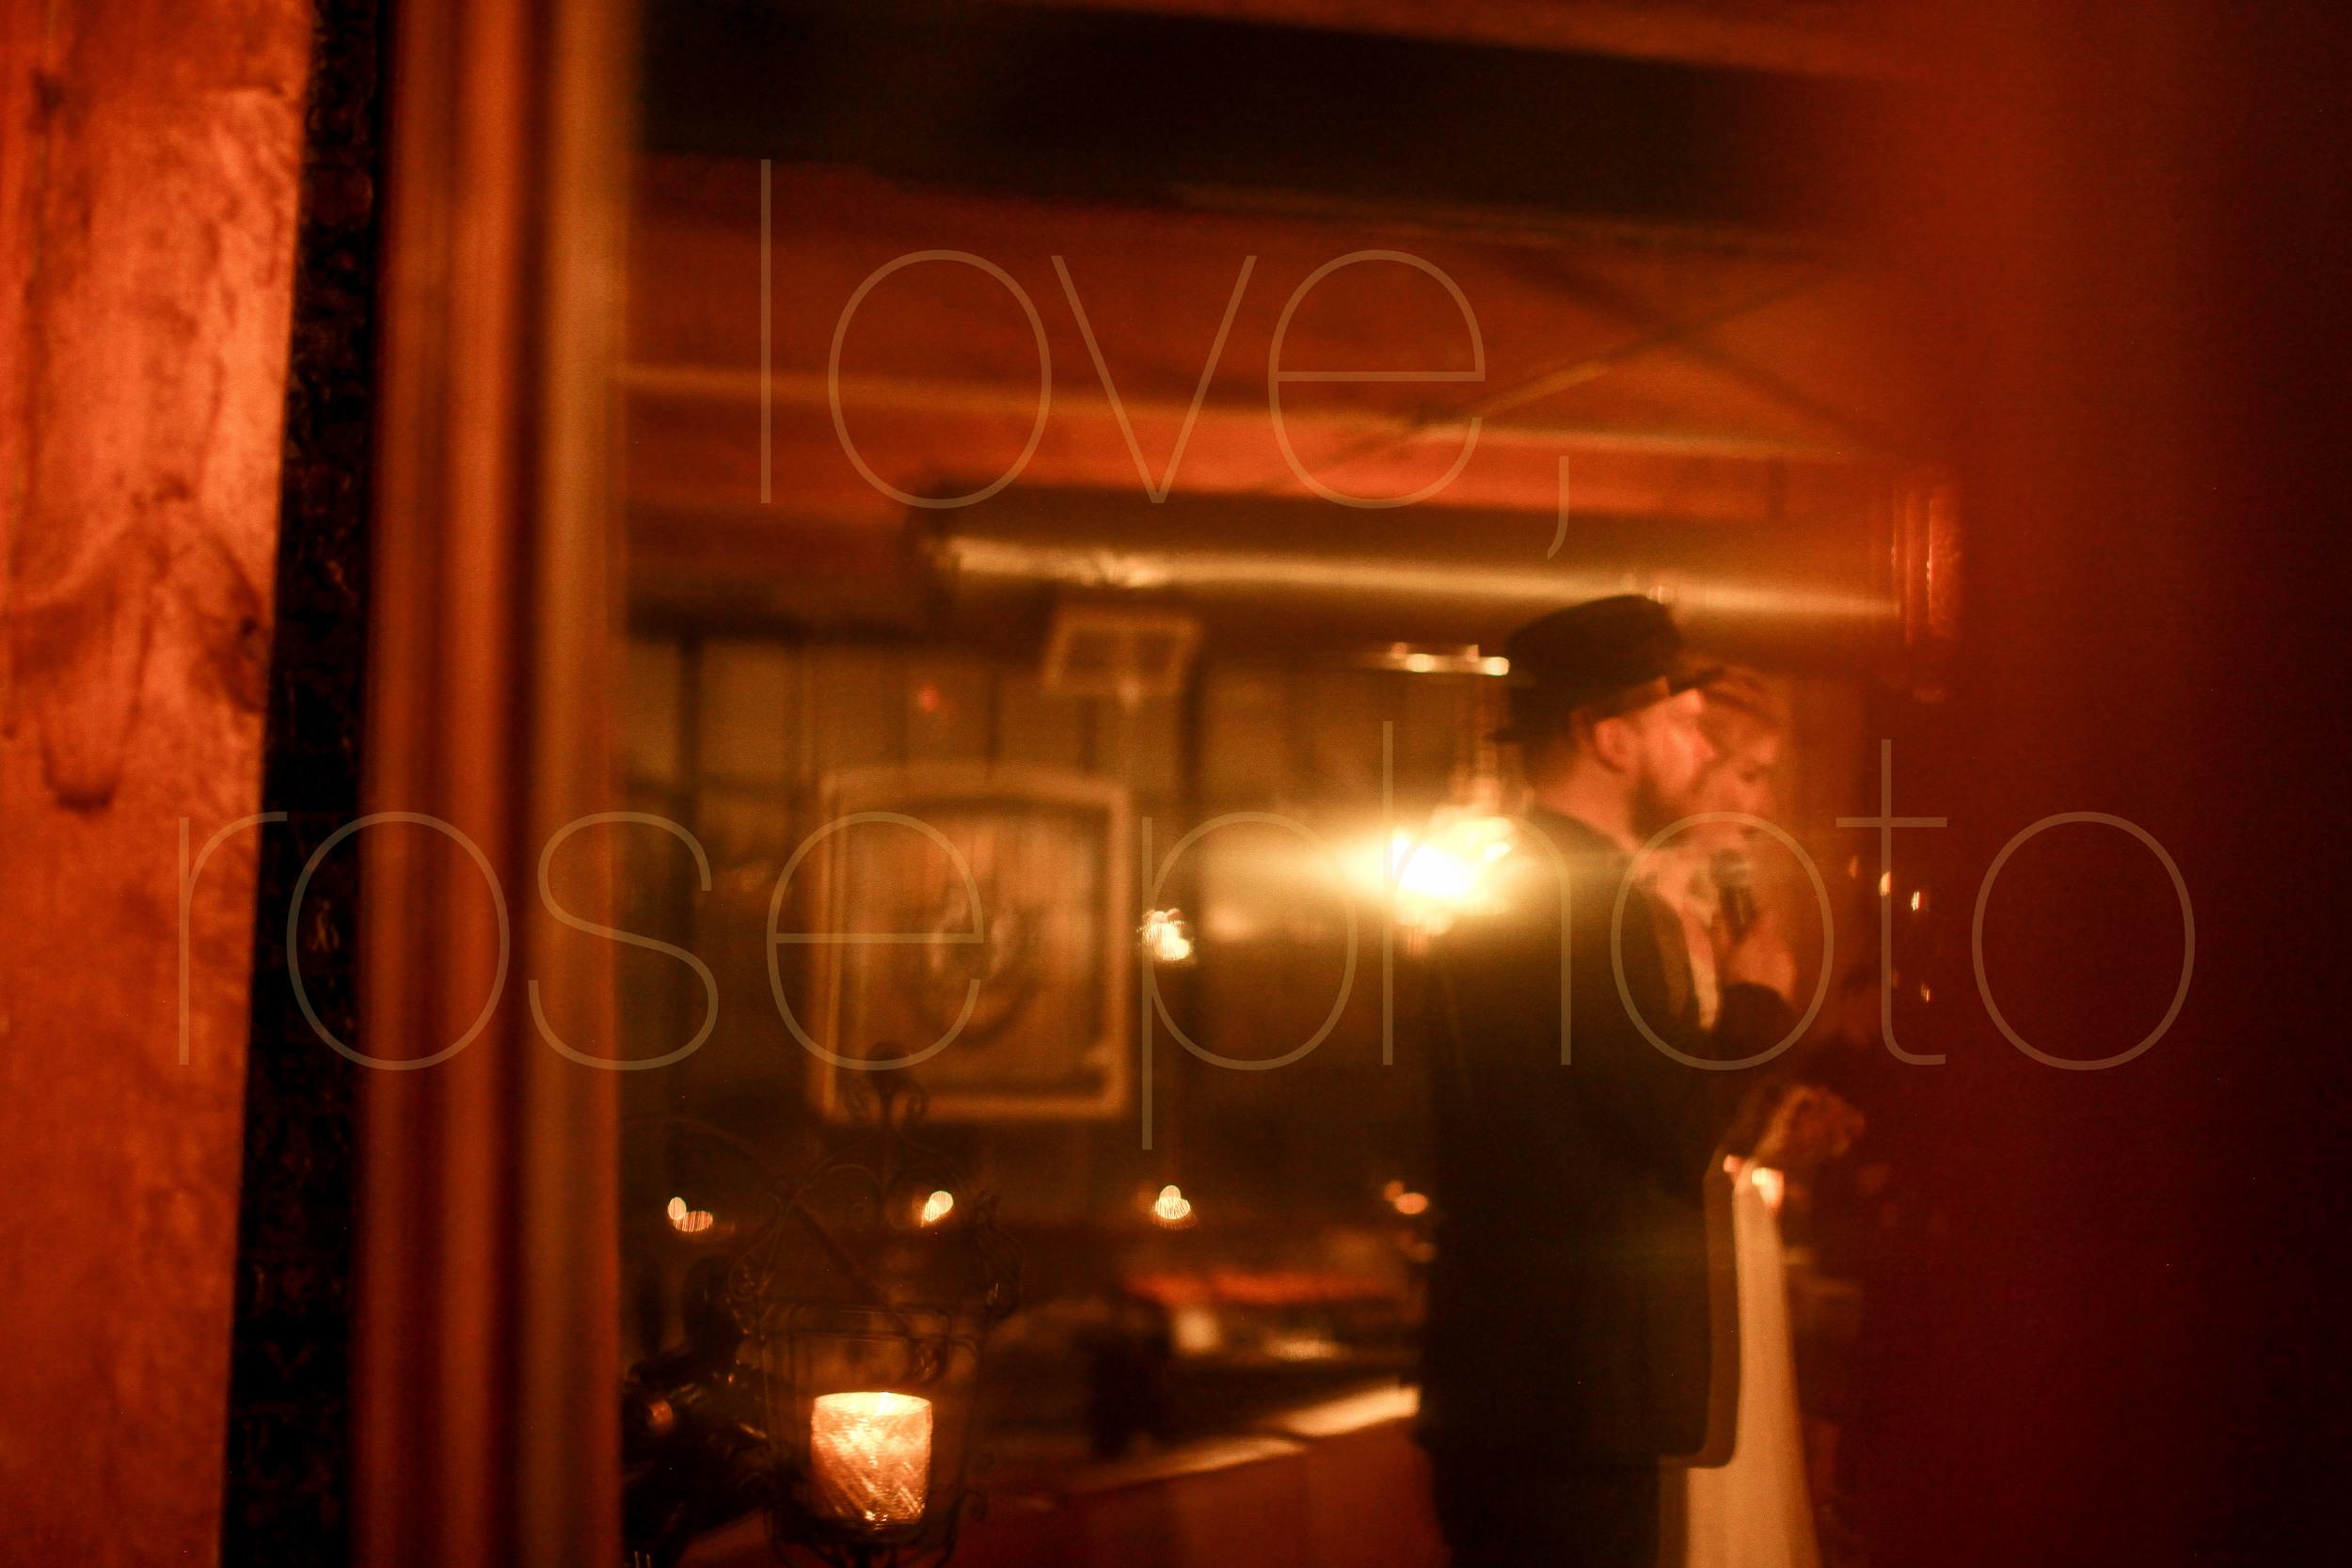 West Fulton Chicago Wedding Venue Salvage One photography enagement photos bride groom first dance-34.jpg